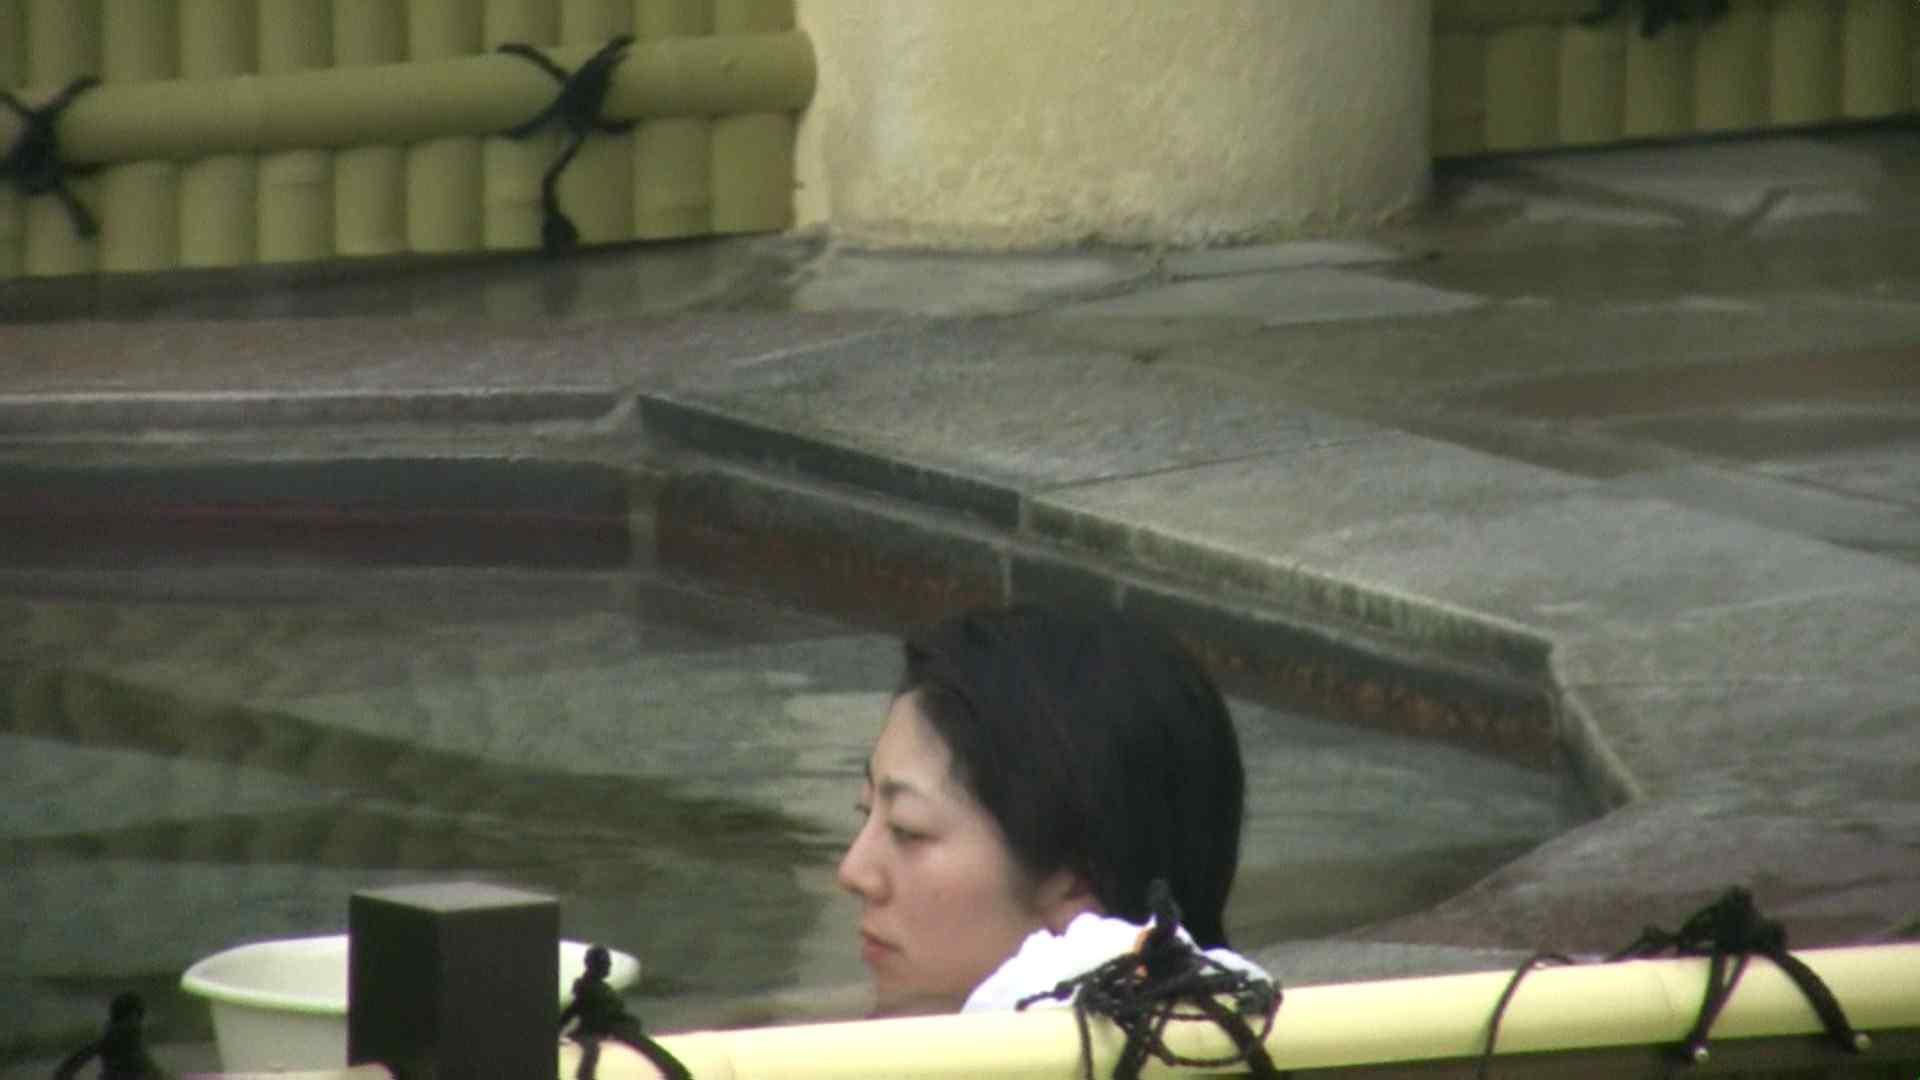 Aquaな露天風呂Vol.04 露天風呂編 | 盗撮シリーズ  94PIX 83